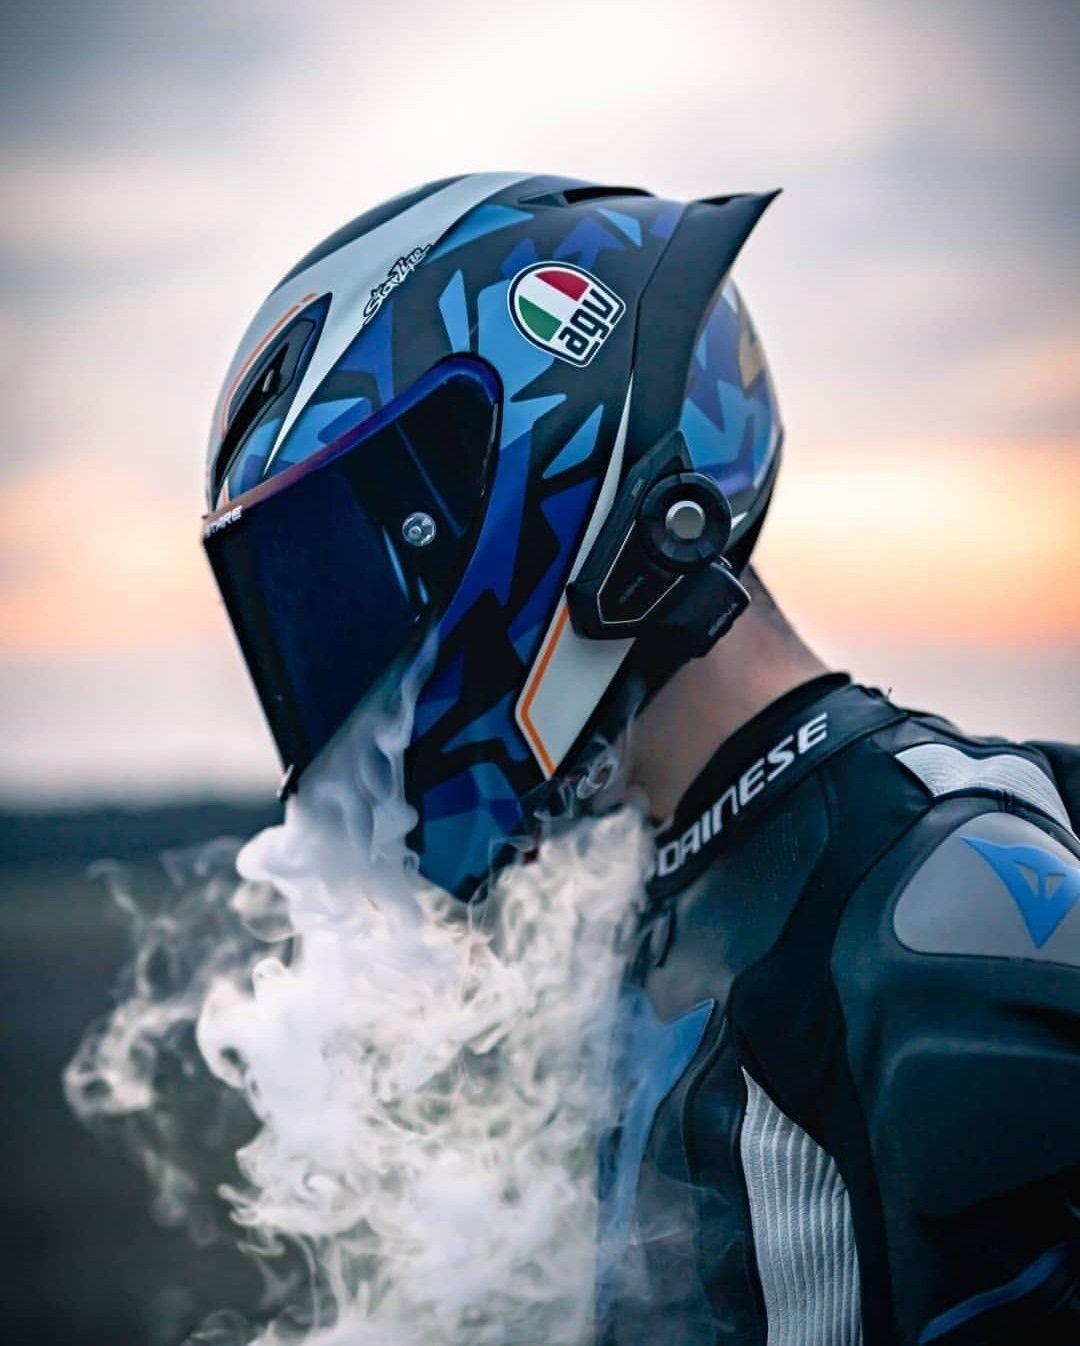 Pin By Amaz Sikak Sekali On Bike In 2020 Dirt Bike Helmets Bike Photoshoot Sport Bike Helmets